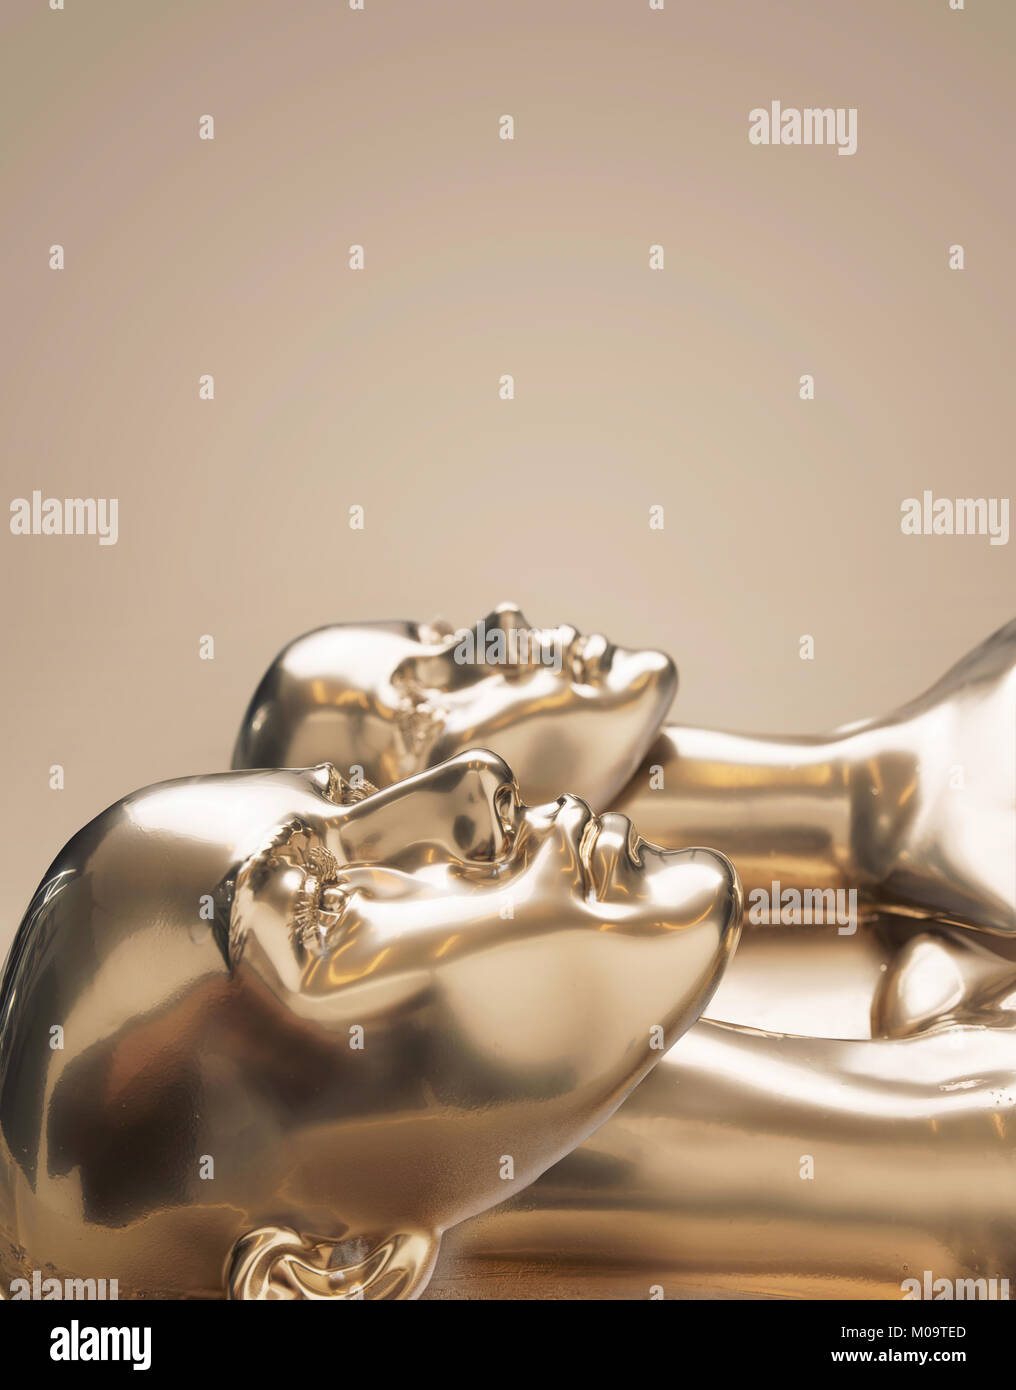 Golden scuplture of human - work of art Stock Photo